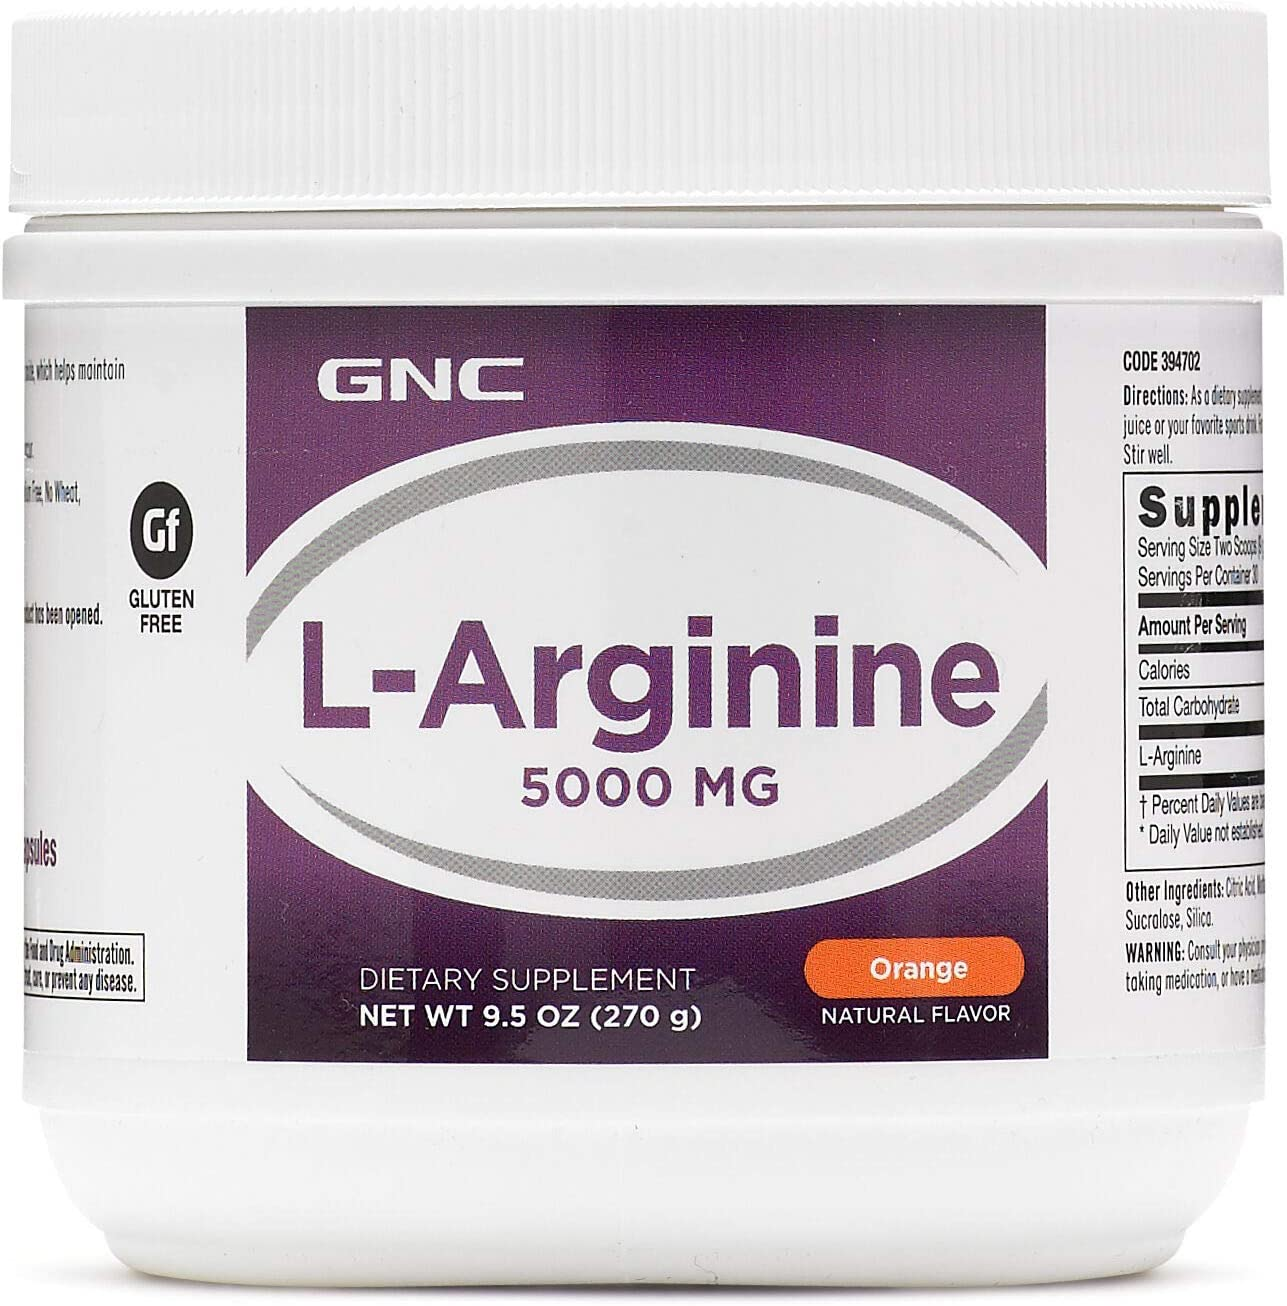 Primal Blueprint Damage Control, Micronutrient SuperFormula that includes 12 Antioxidants, 180 Count